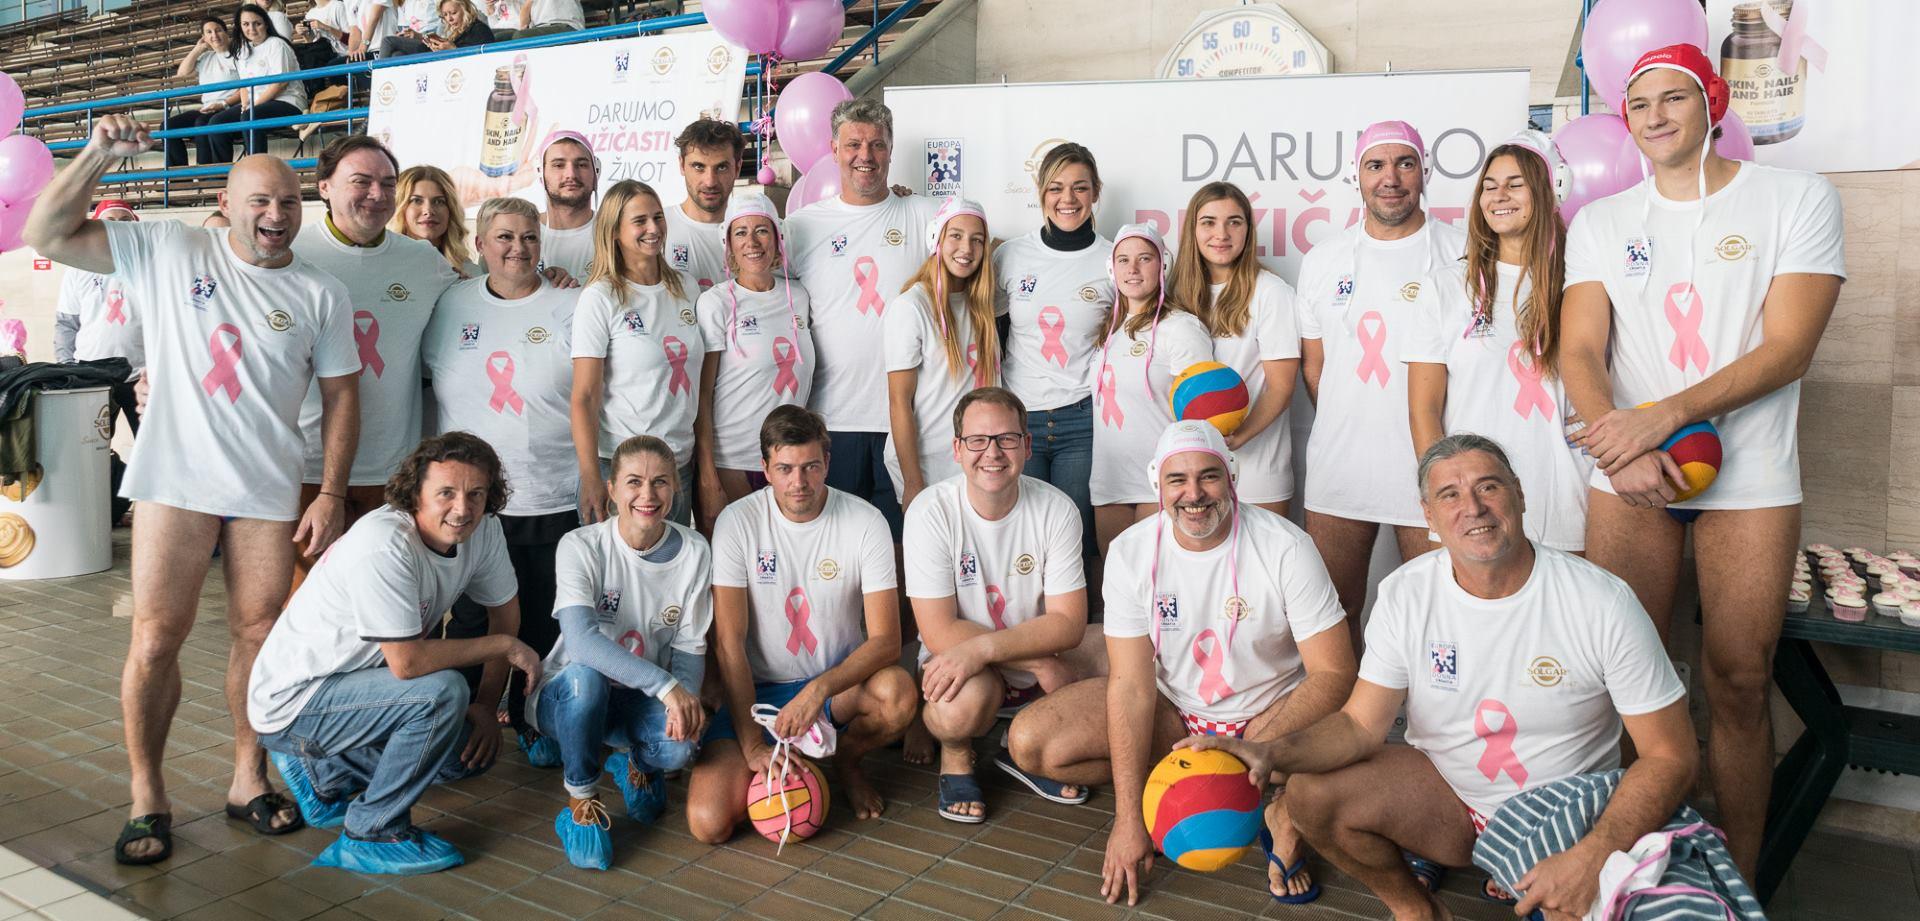 FOTO: 'Ružičastom' vaterpolskom utakmicom najavljen nastavak kampanje 'Darujmo ružičasti život'